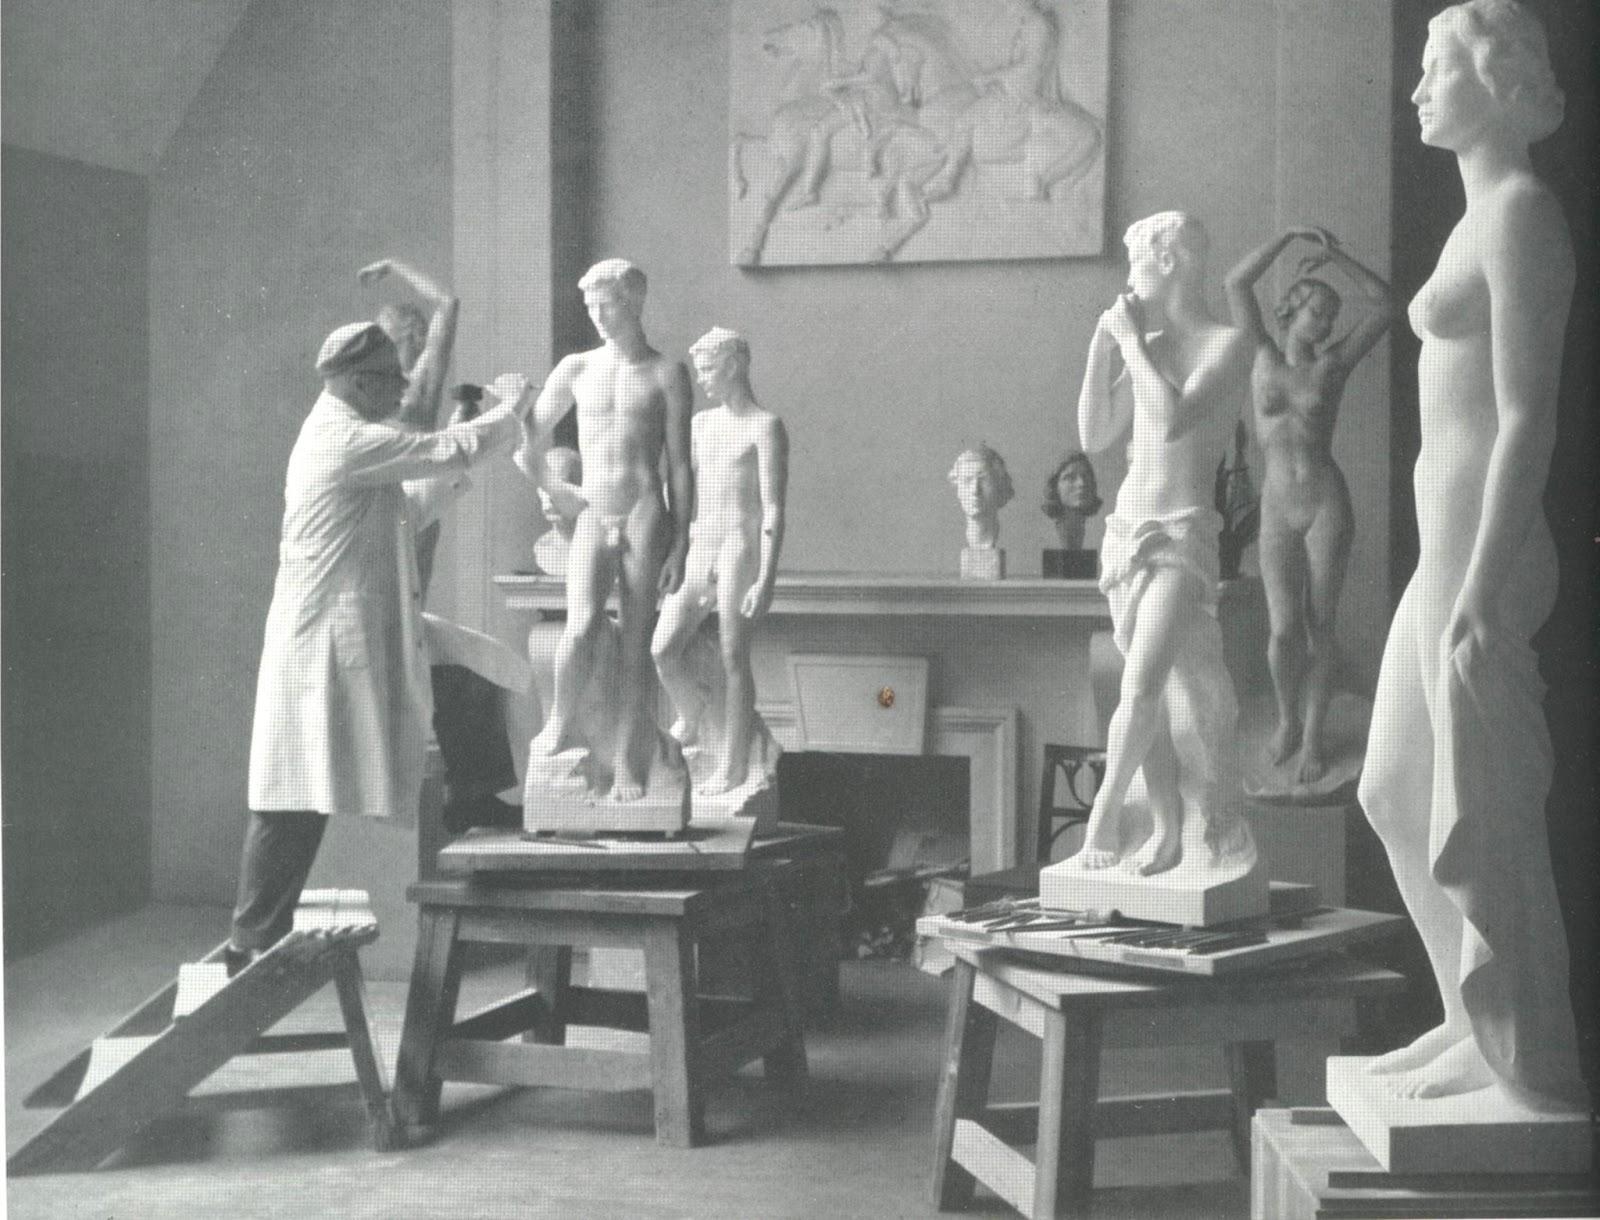 L'artiste - René François Sully Prudhomme Fritz+Klimsch+atelier+04